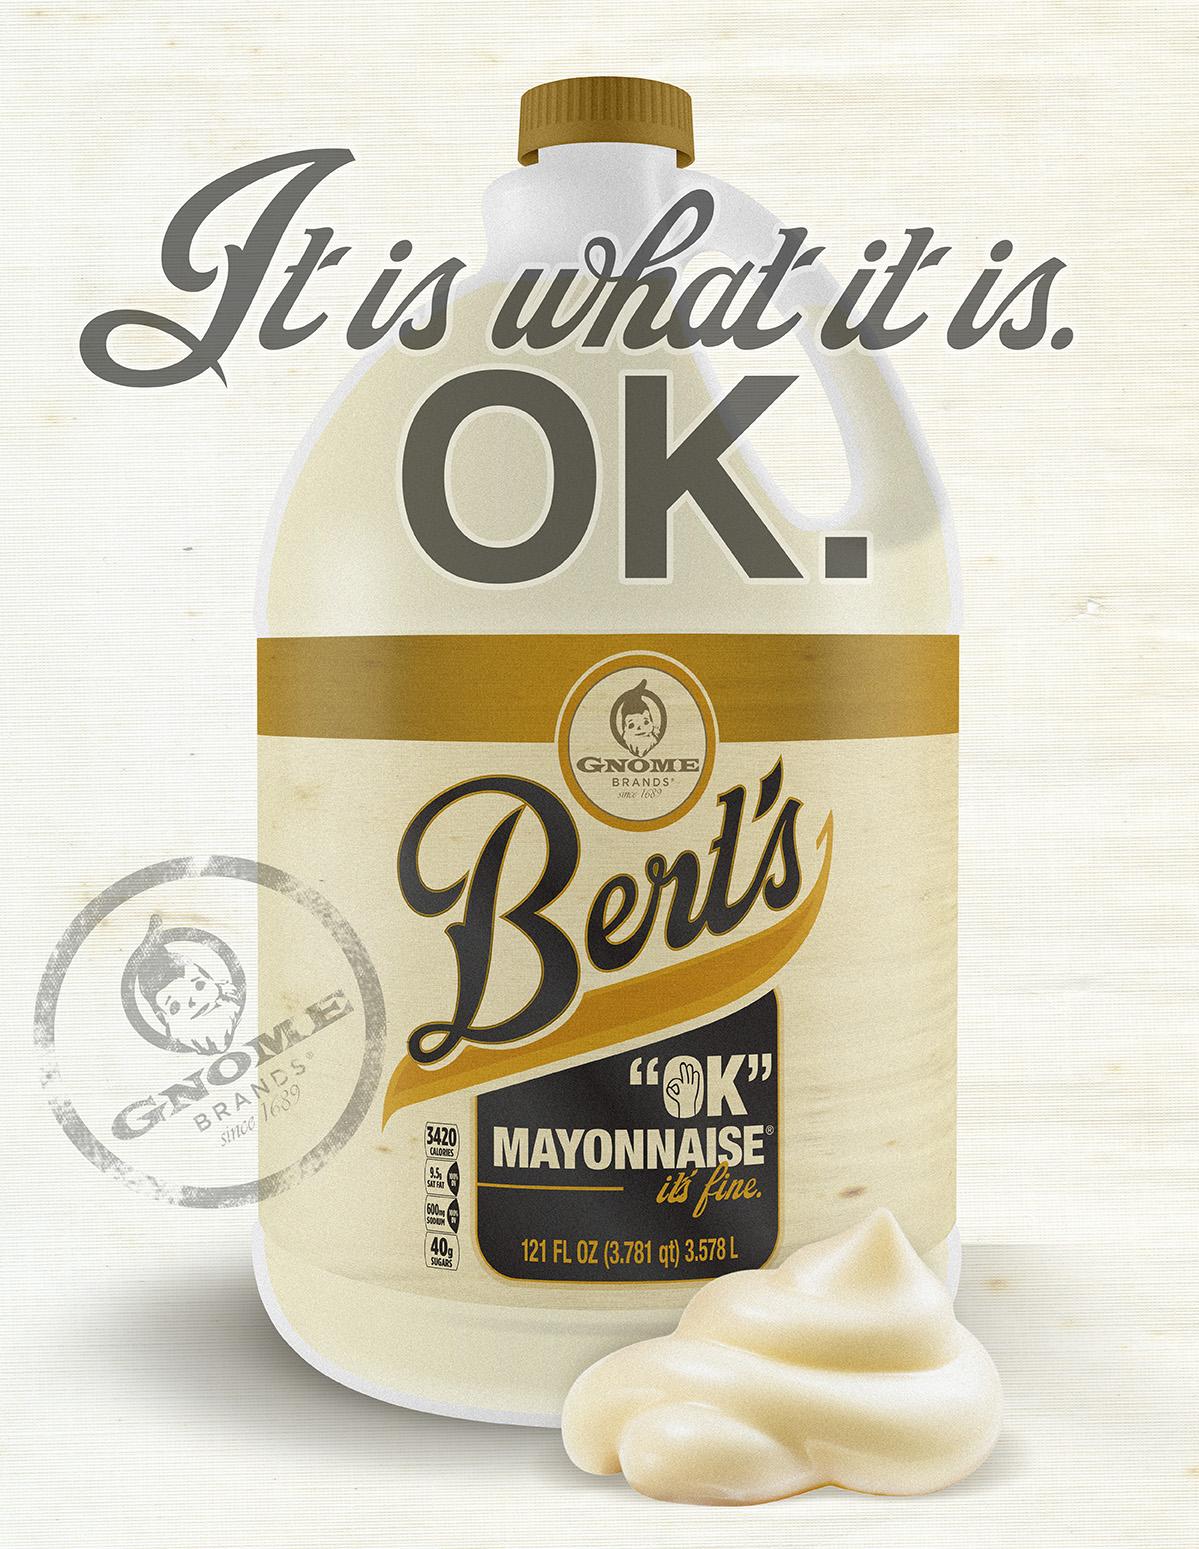 Bert's OK Mayonnaise